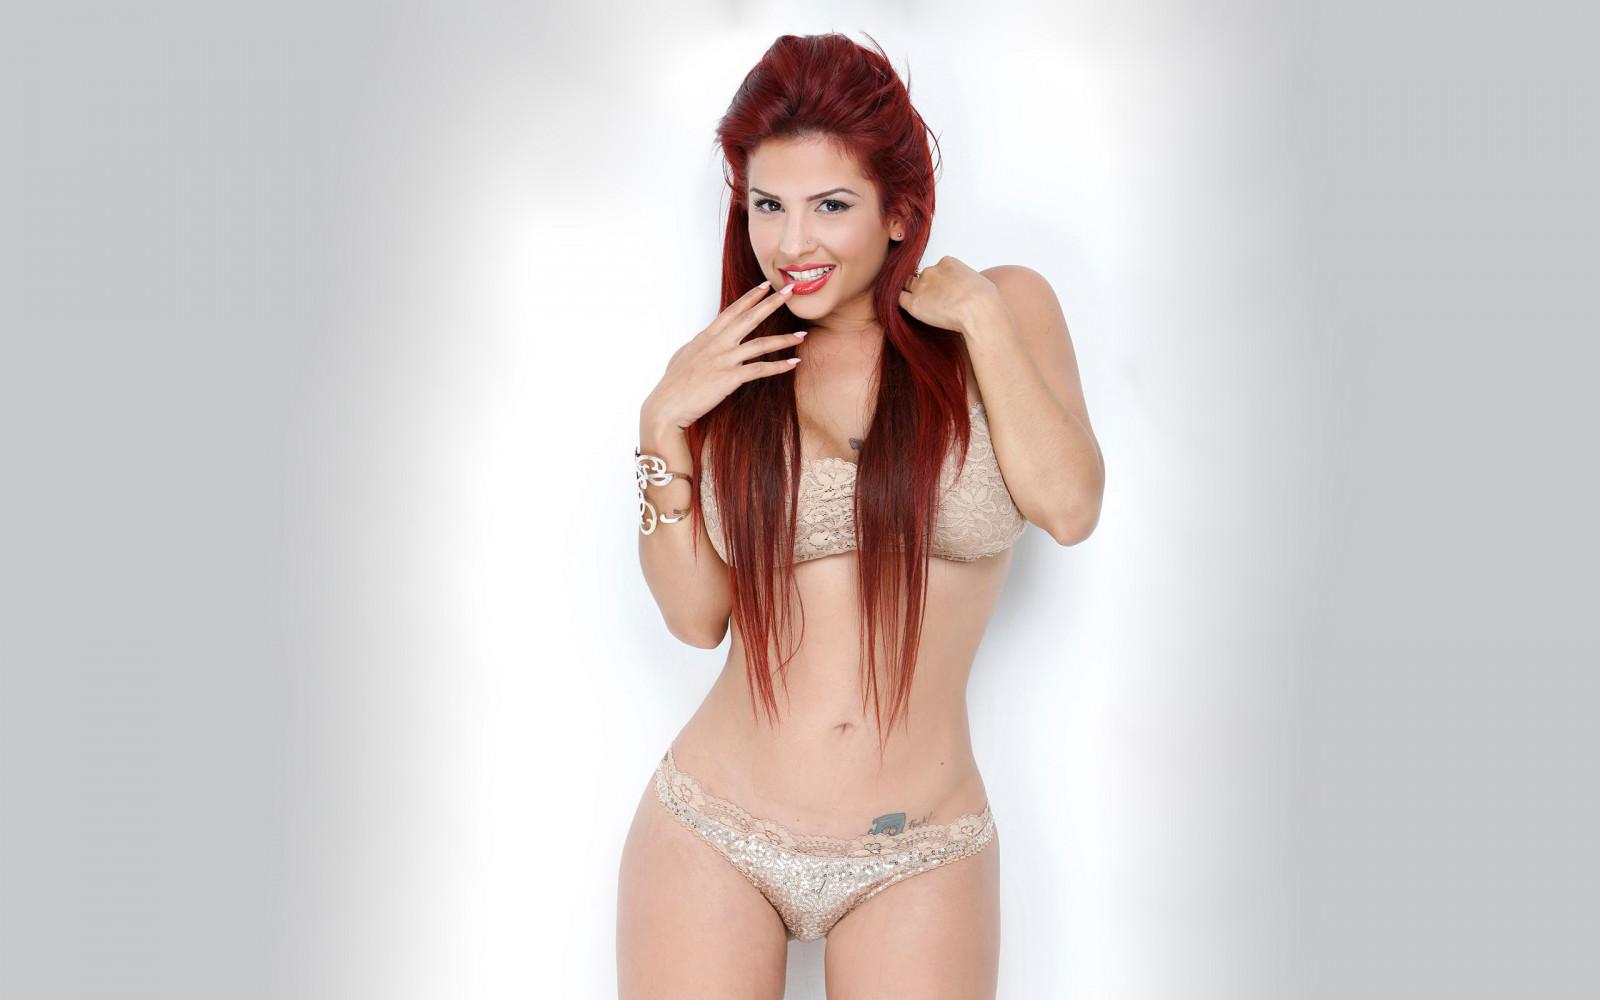 Bud redhead osx torrent #1